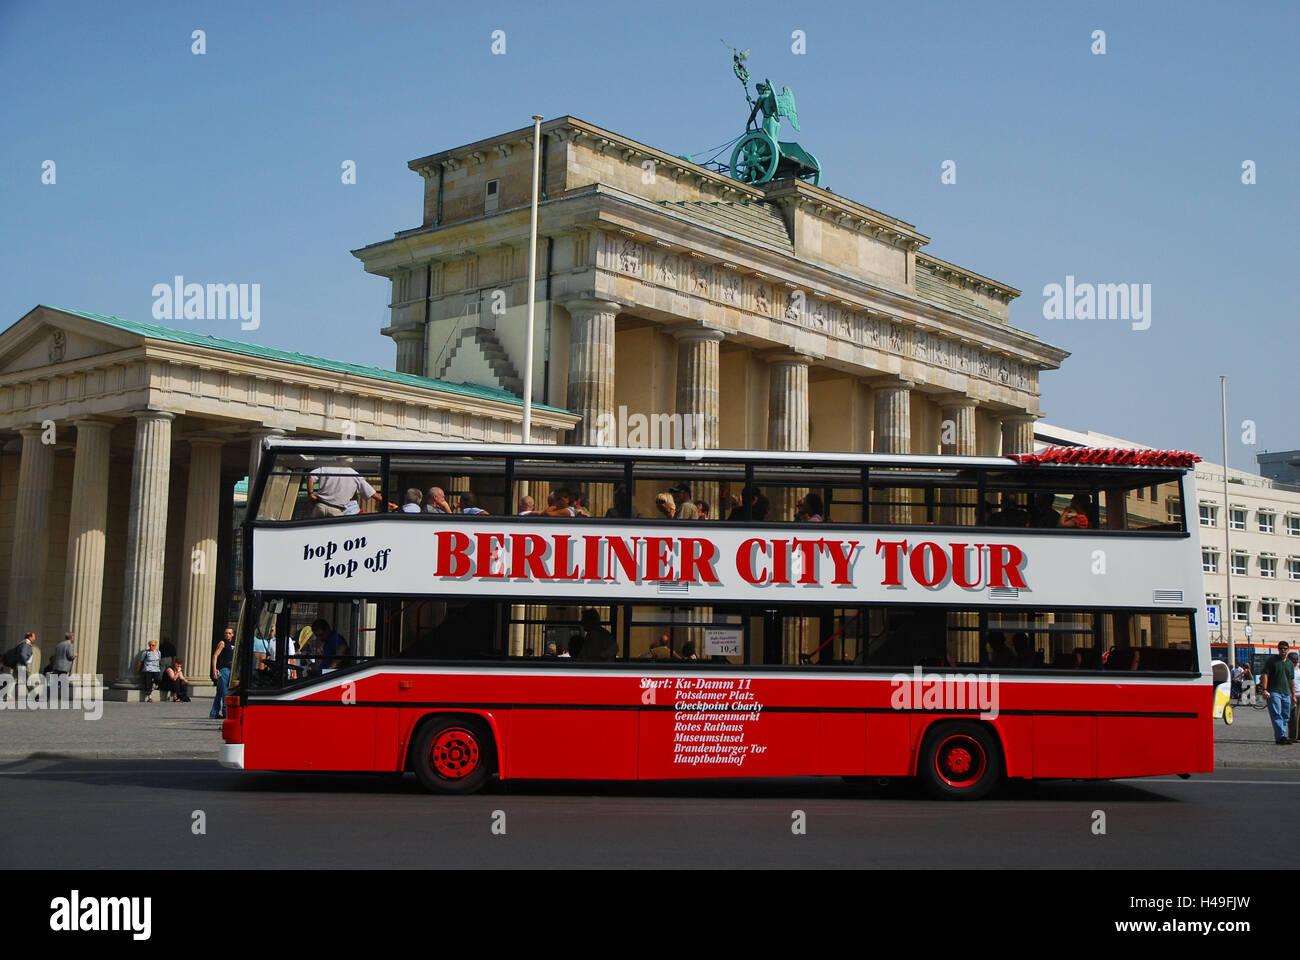 germany berlin the brandenburg gate sightseeing bus capital stock photo 123141057 alamy. Black Bedroom Furniture Sets. Home Design Ideas